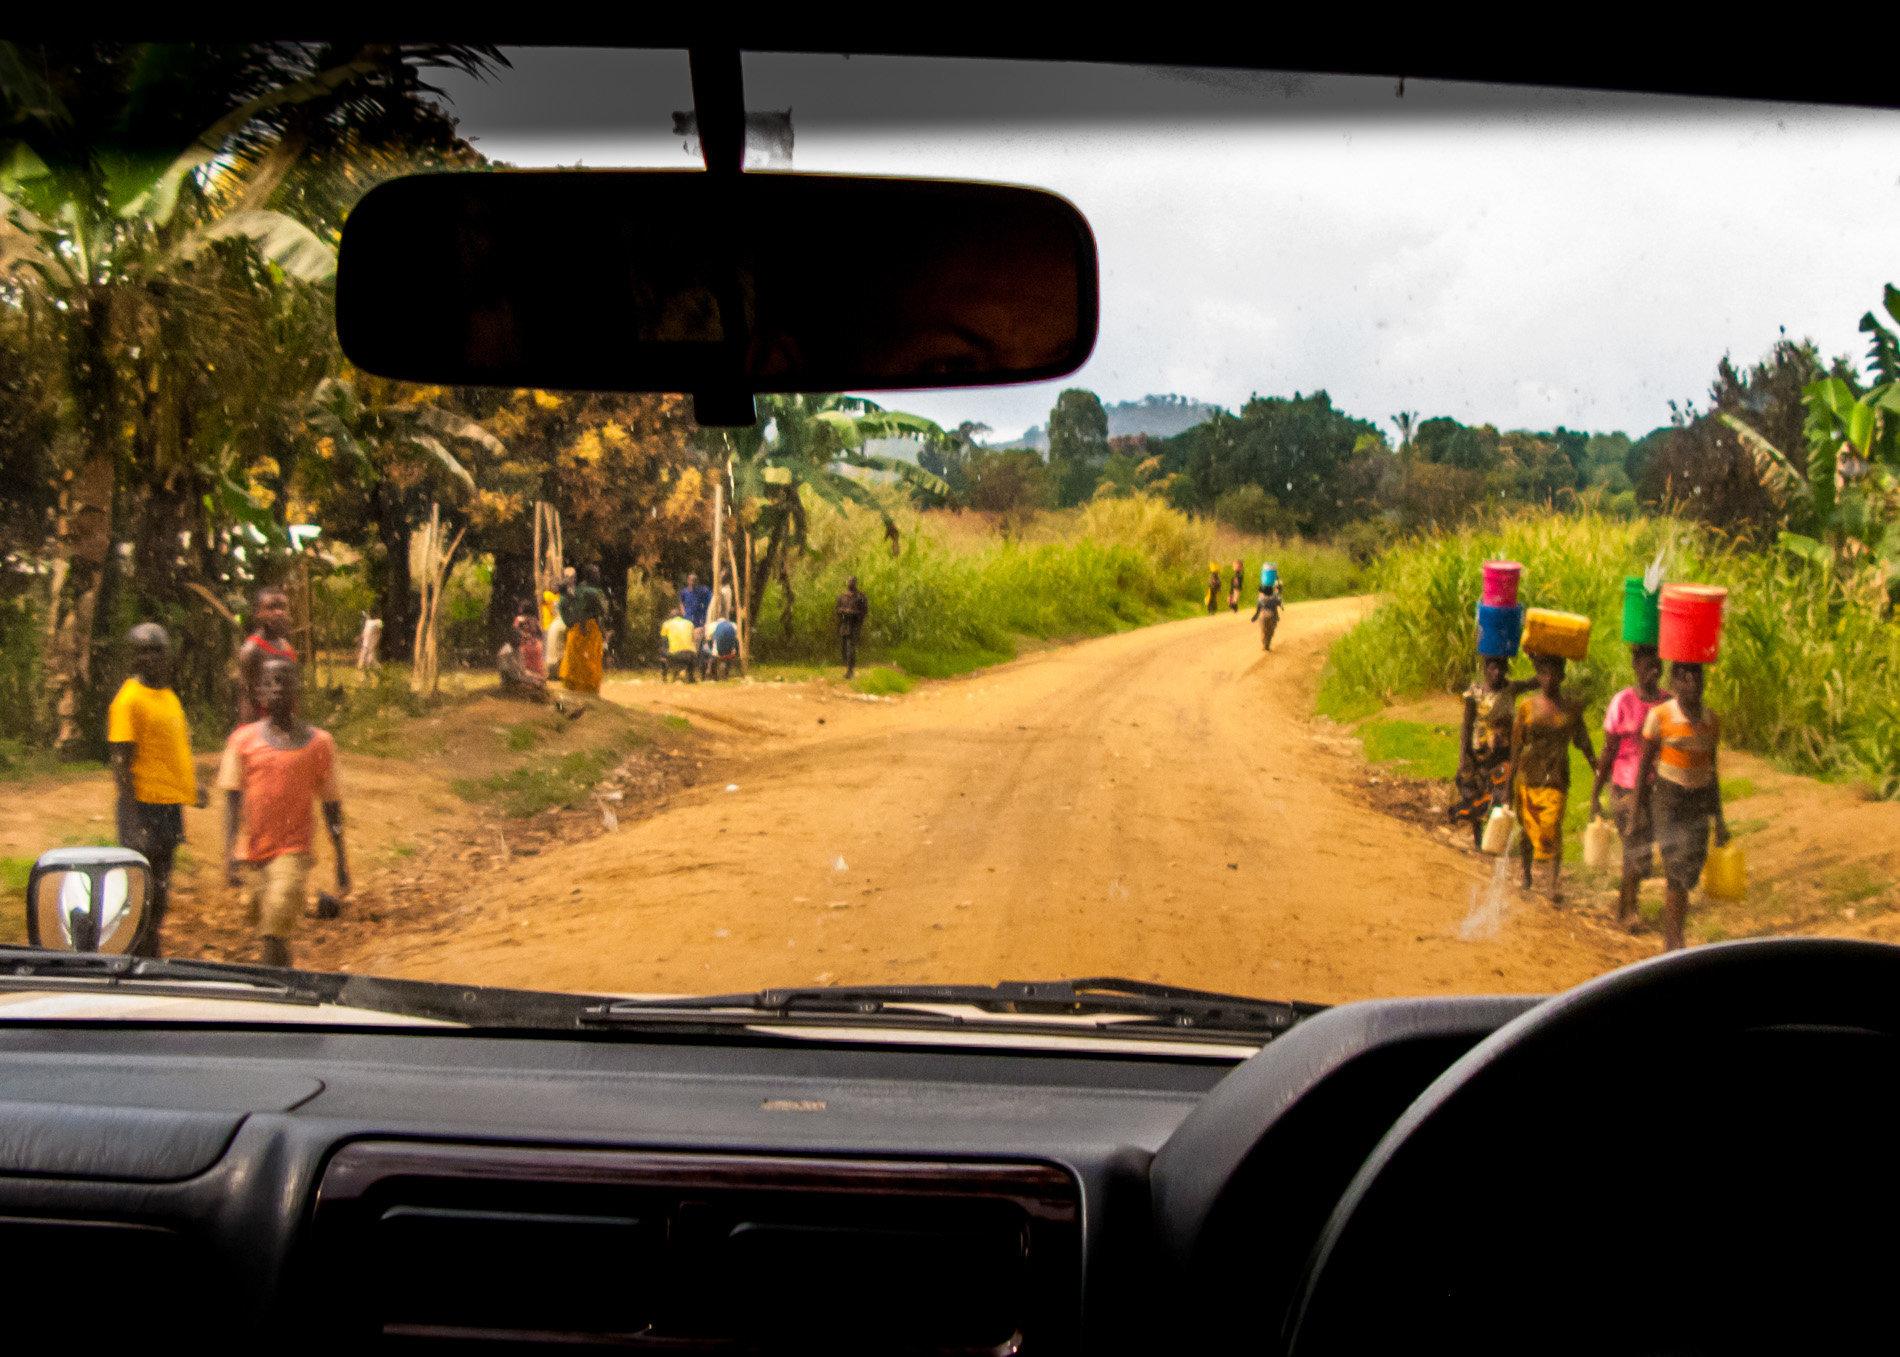 Tanzania,_Back_Seat_View-1767.jpg